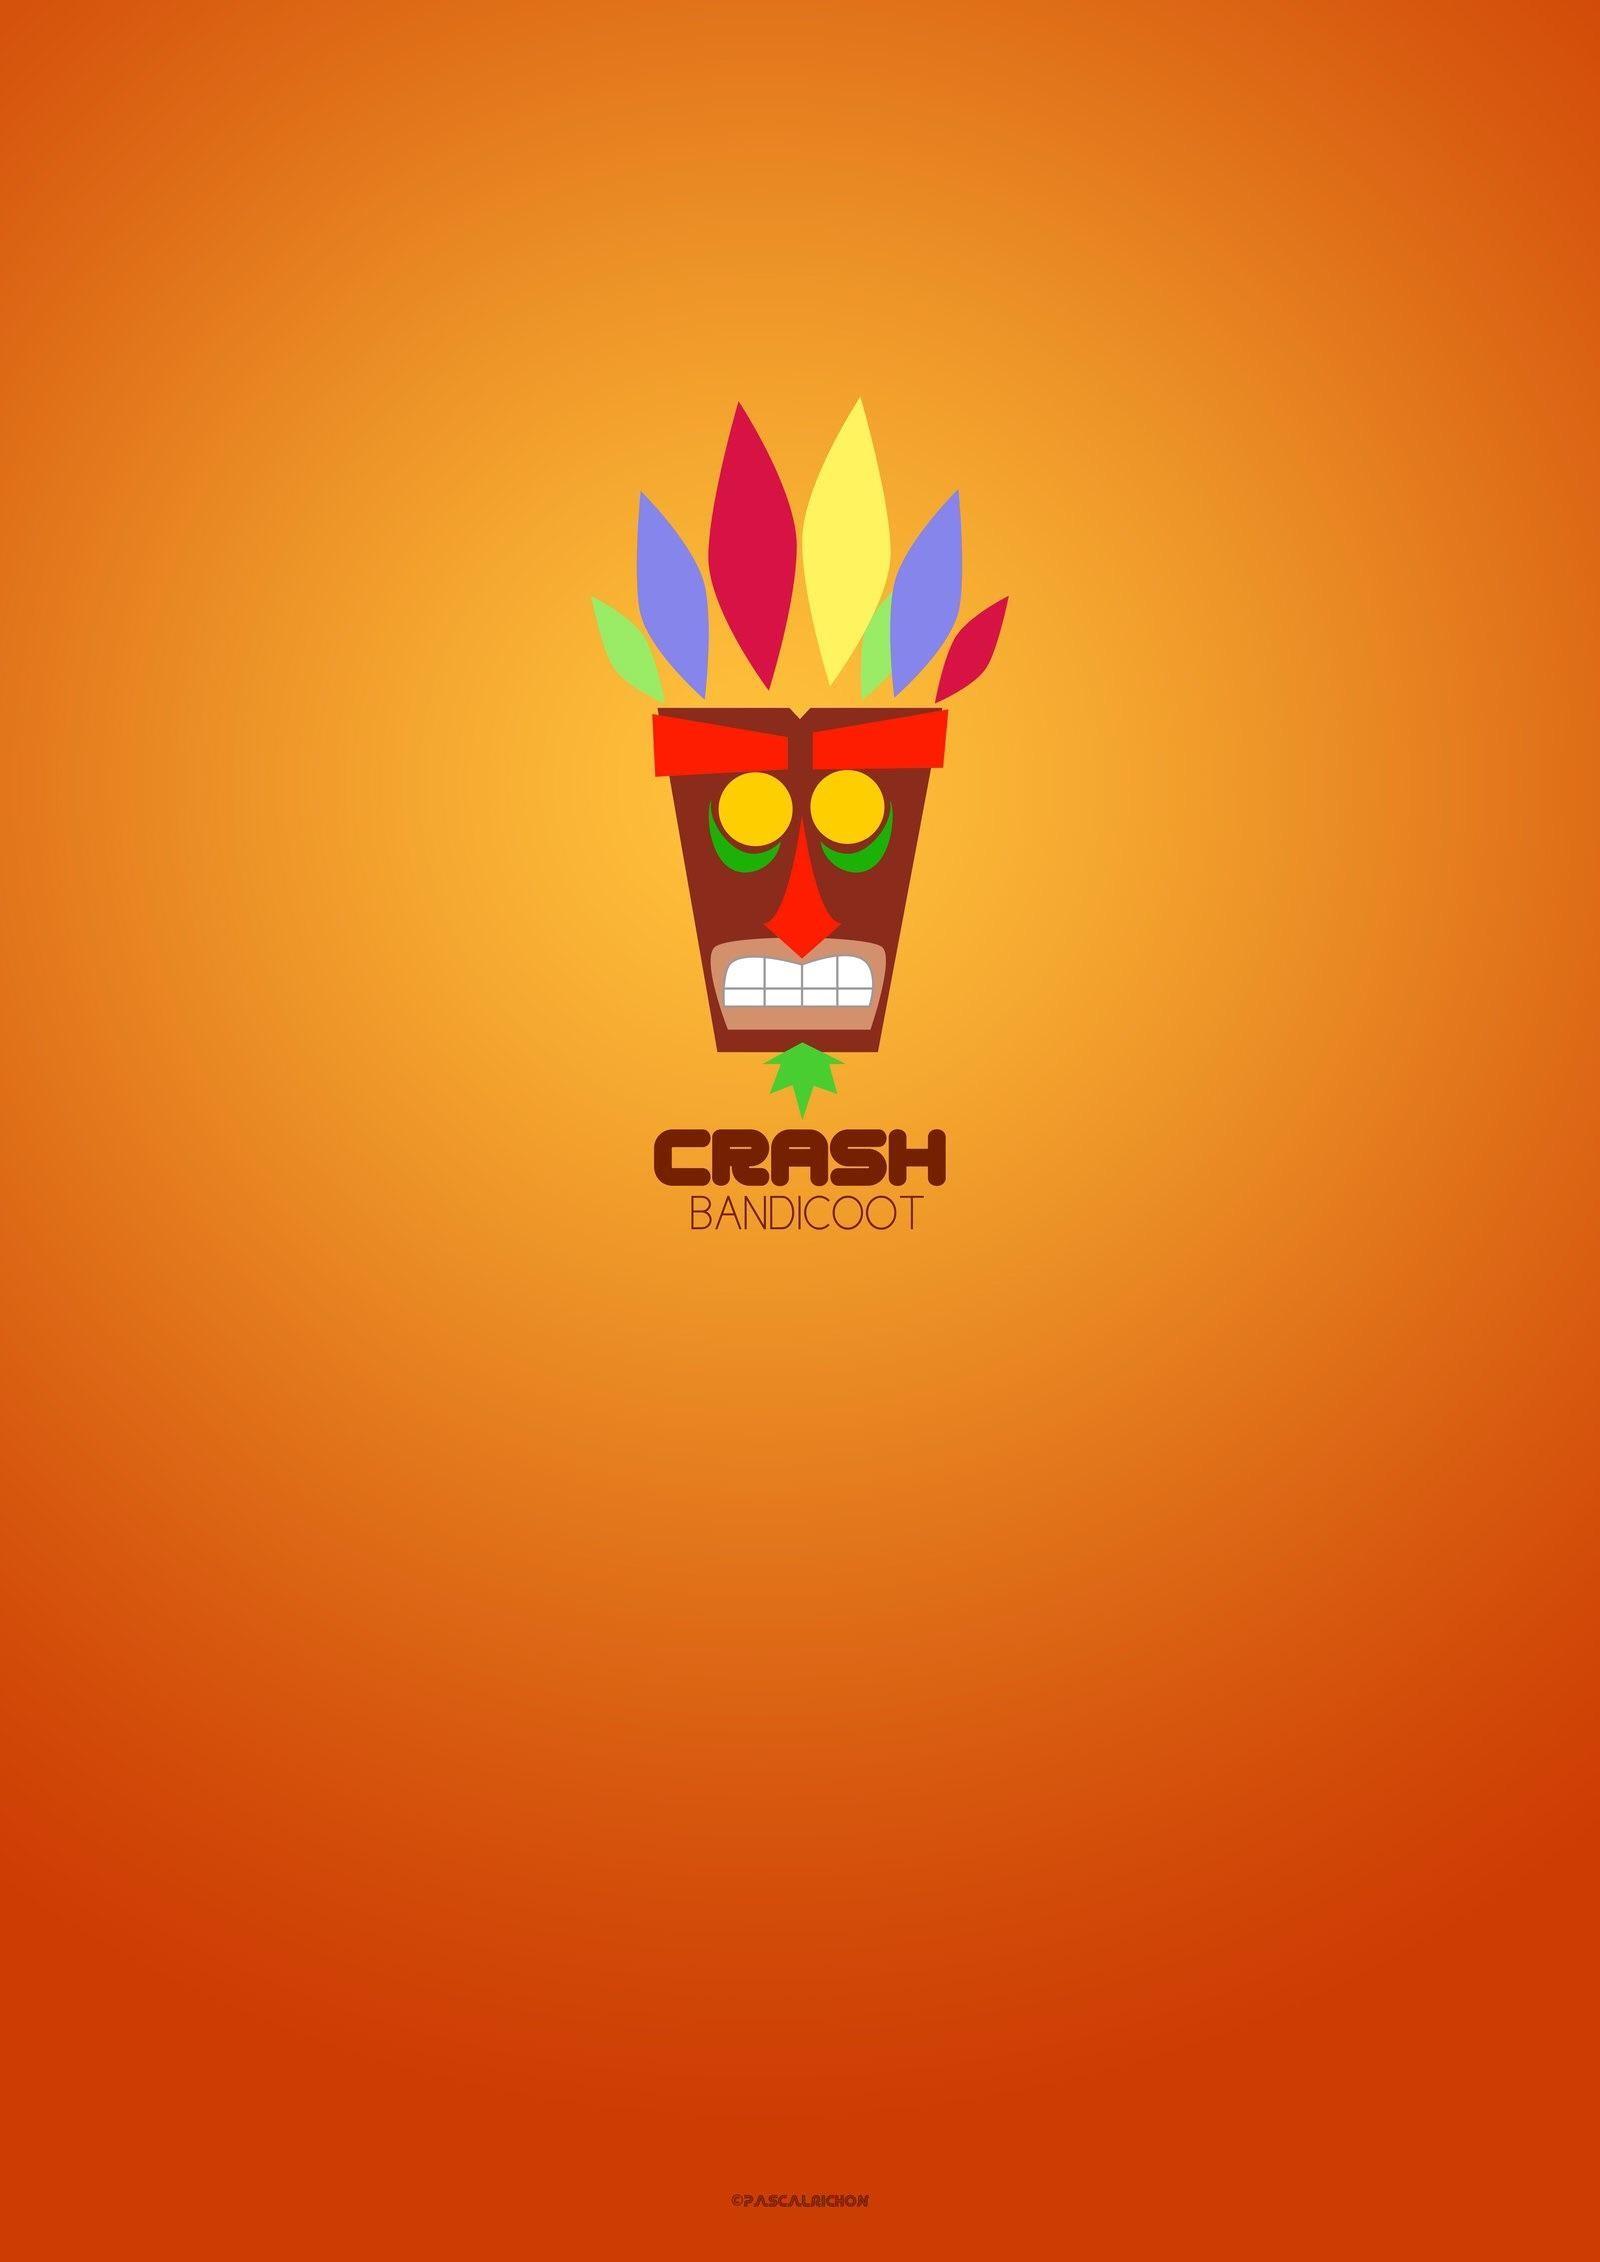 Crash Bandicoot Wallpapers (67+ images)